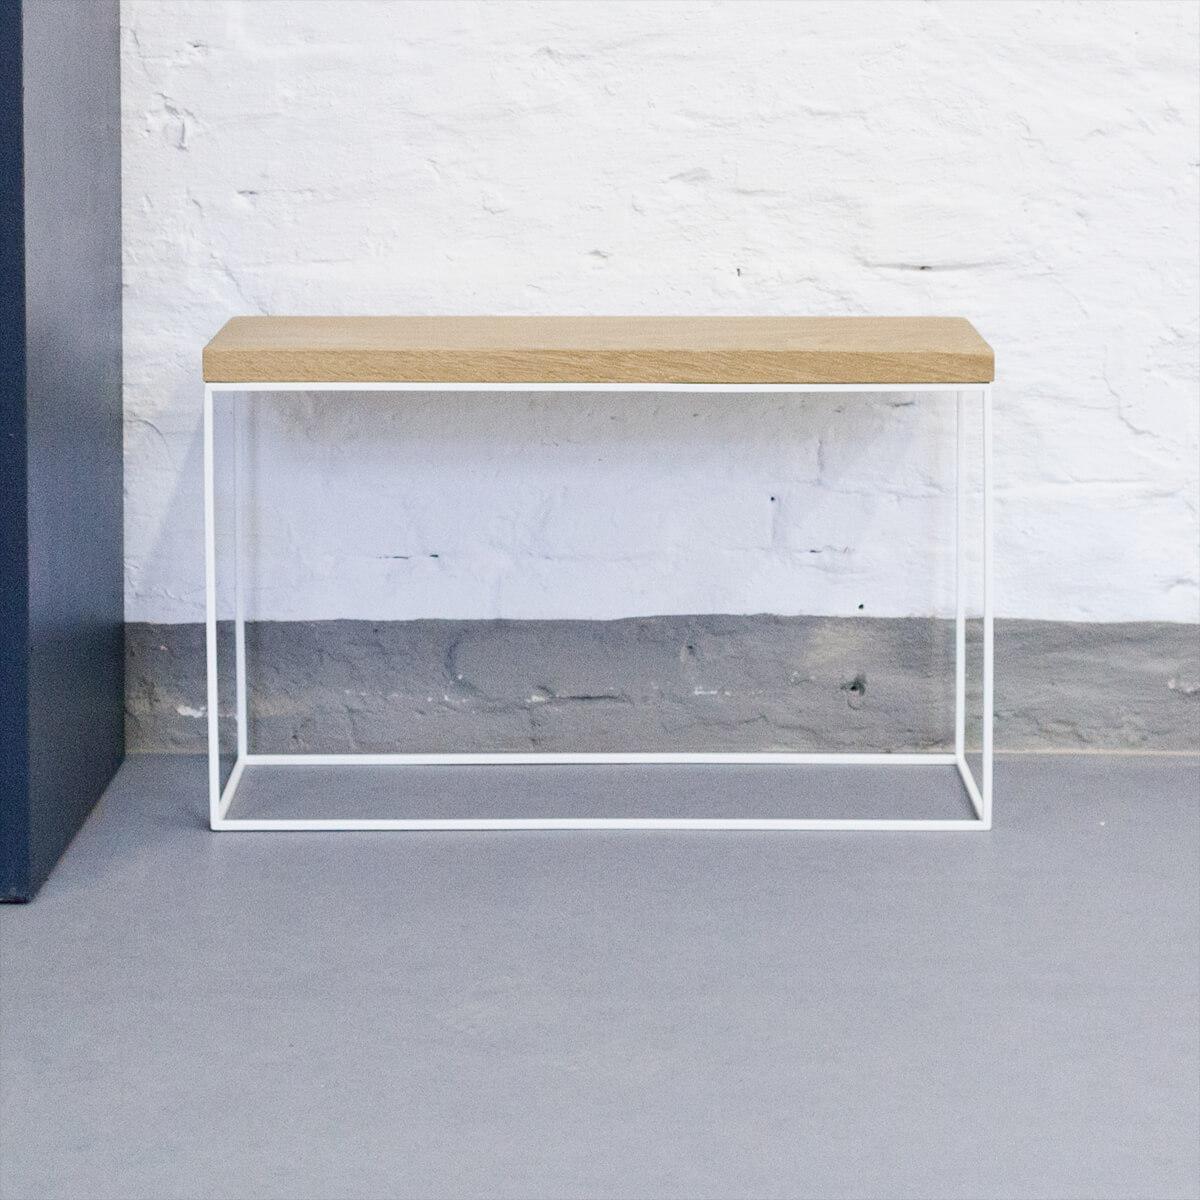 loft ablage bank - n51e12 - design & manufacture